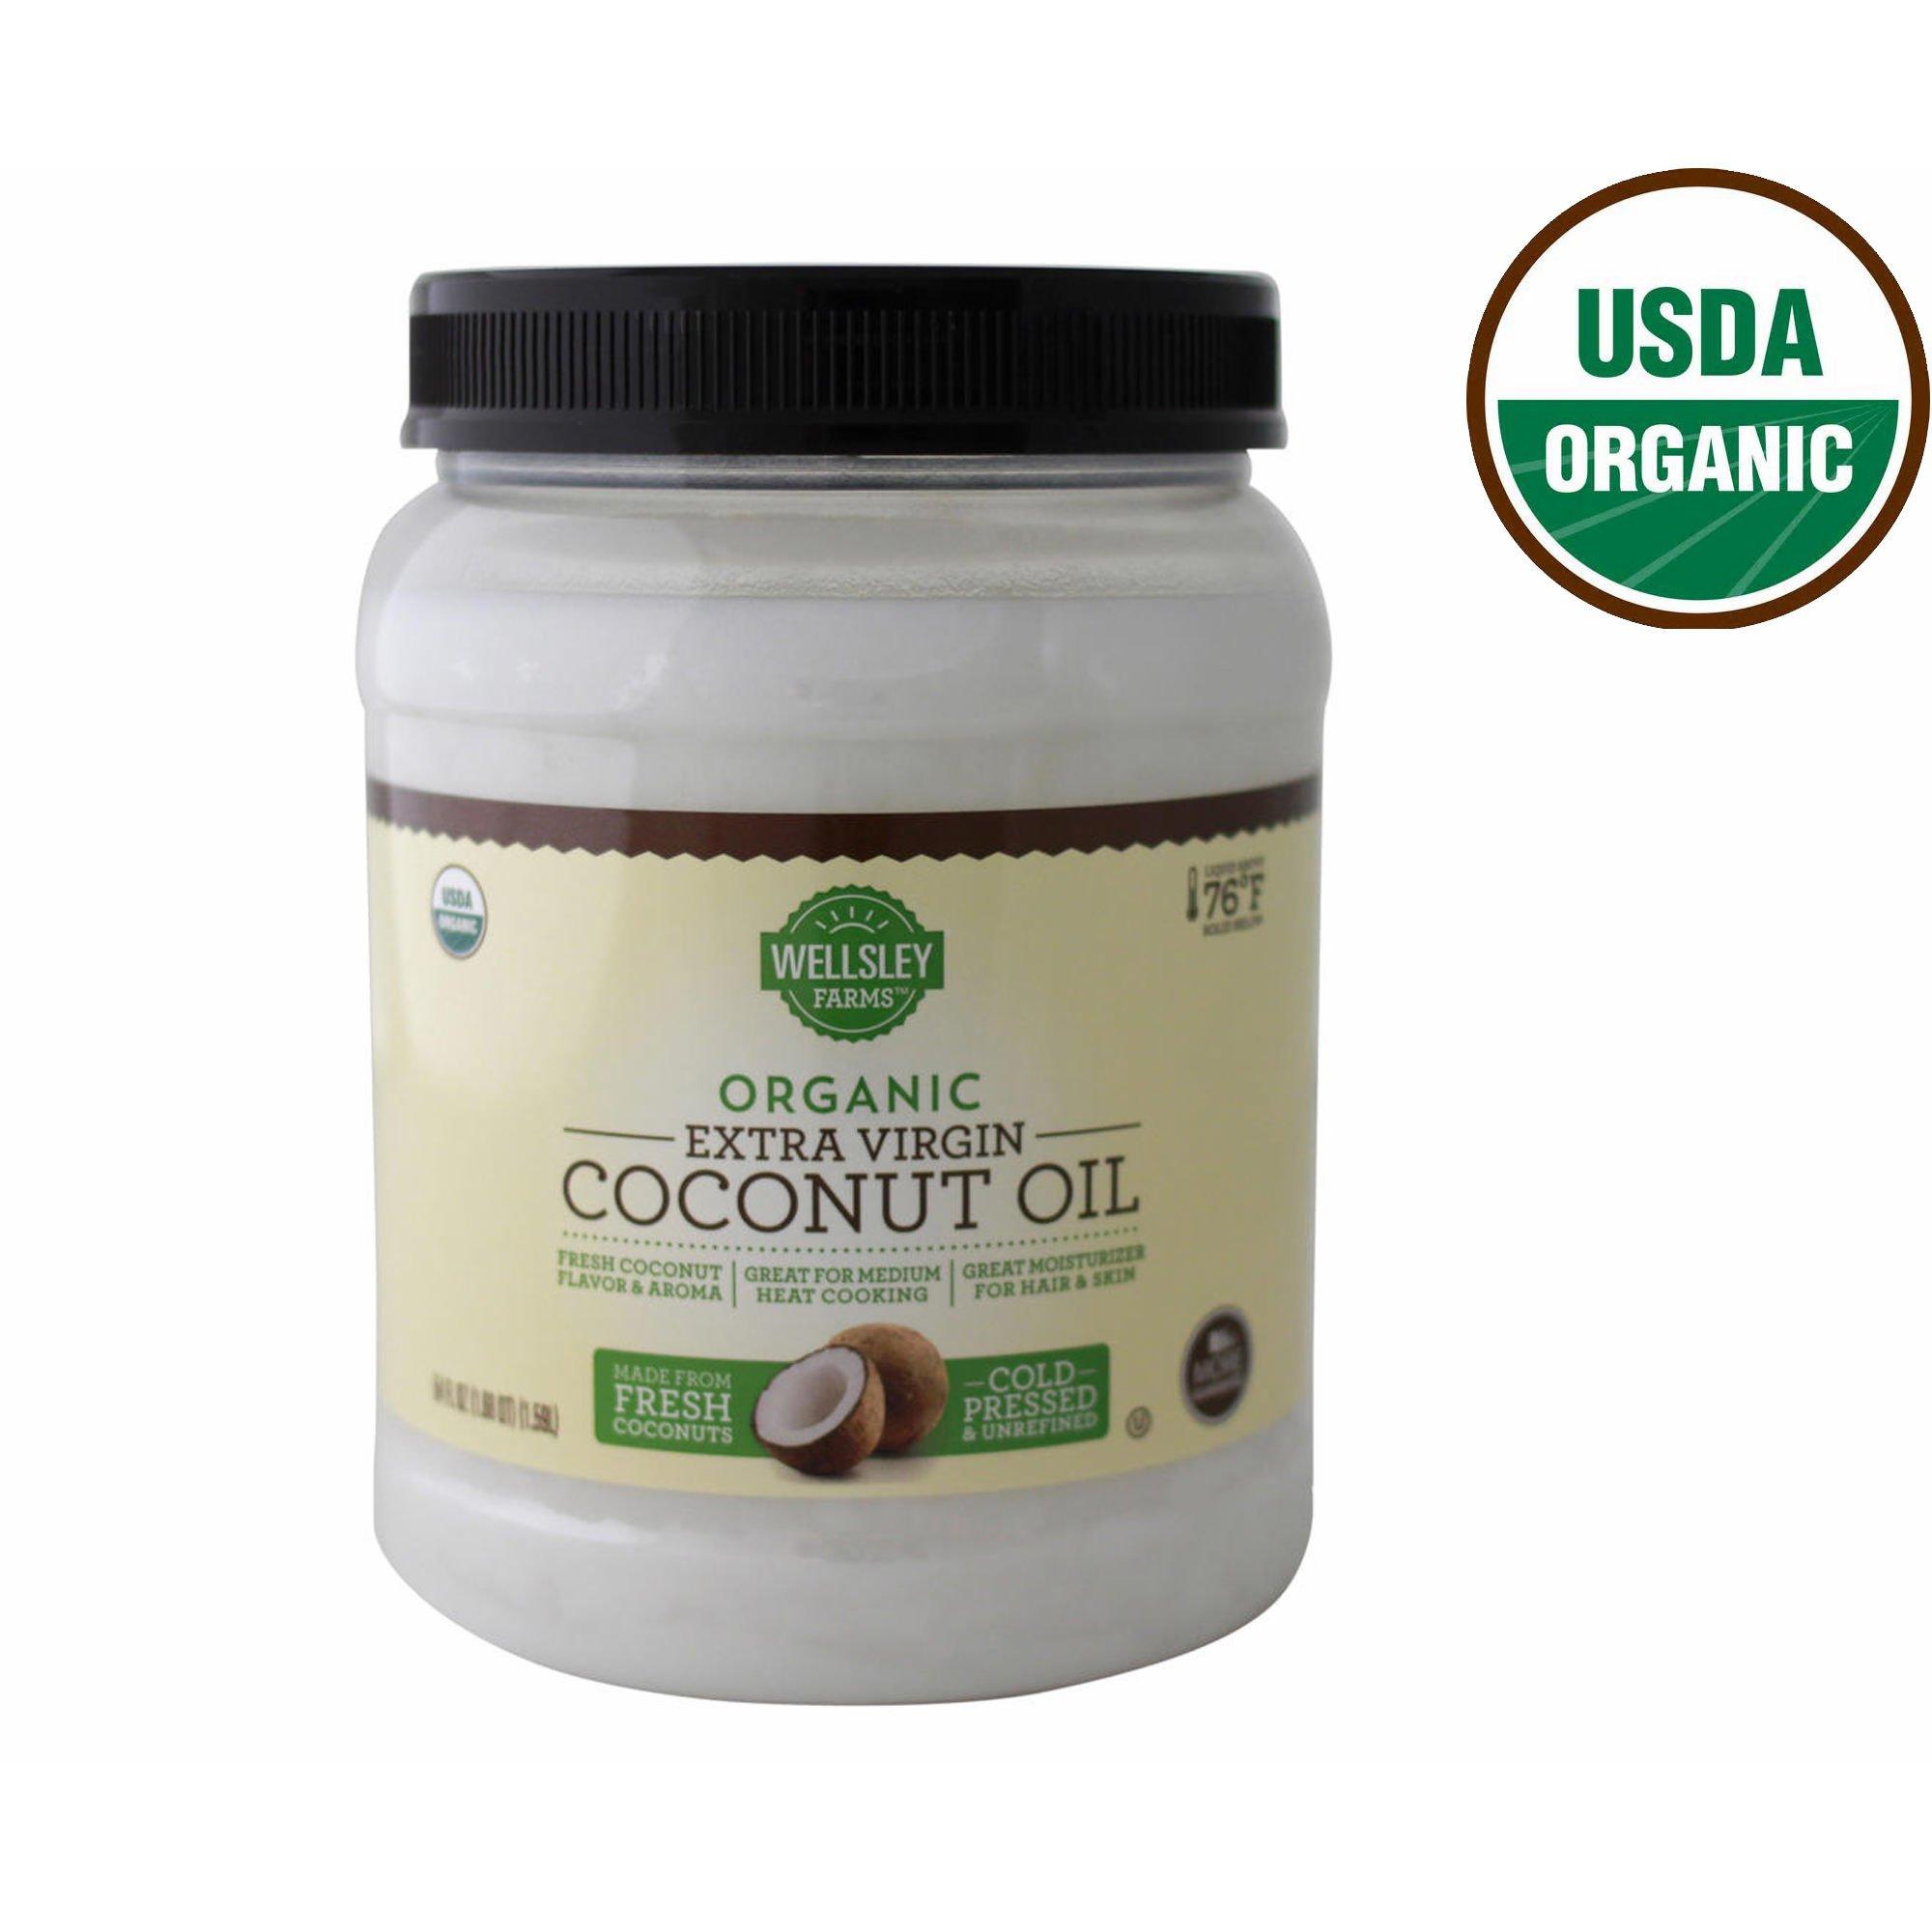 Wellsley Farms Organic Extra Virgin Coconut Oil, 54 oz. (pack of 6) by Wellsley Farms